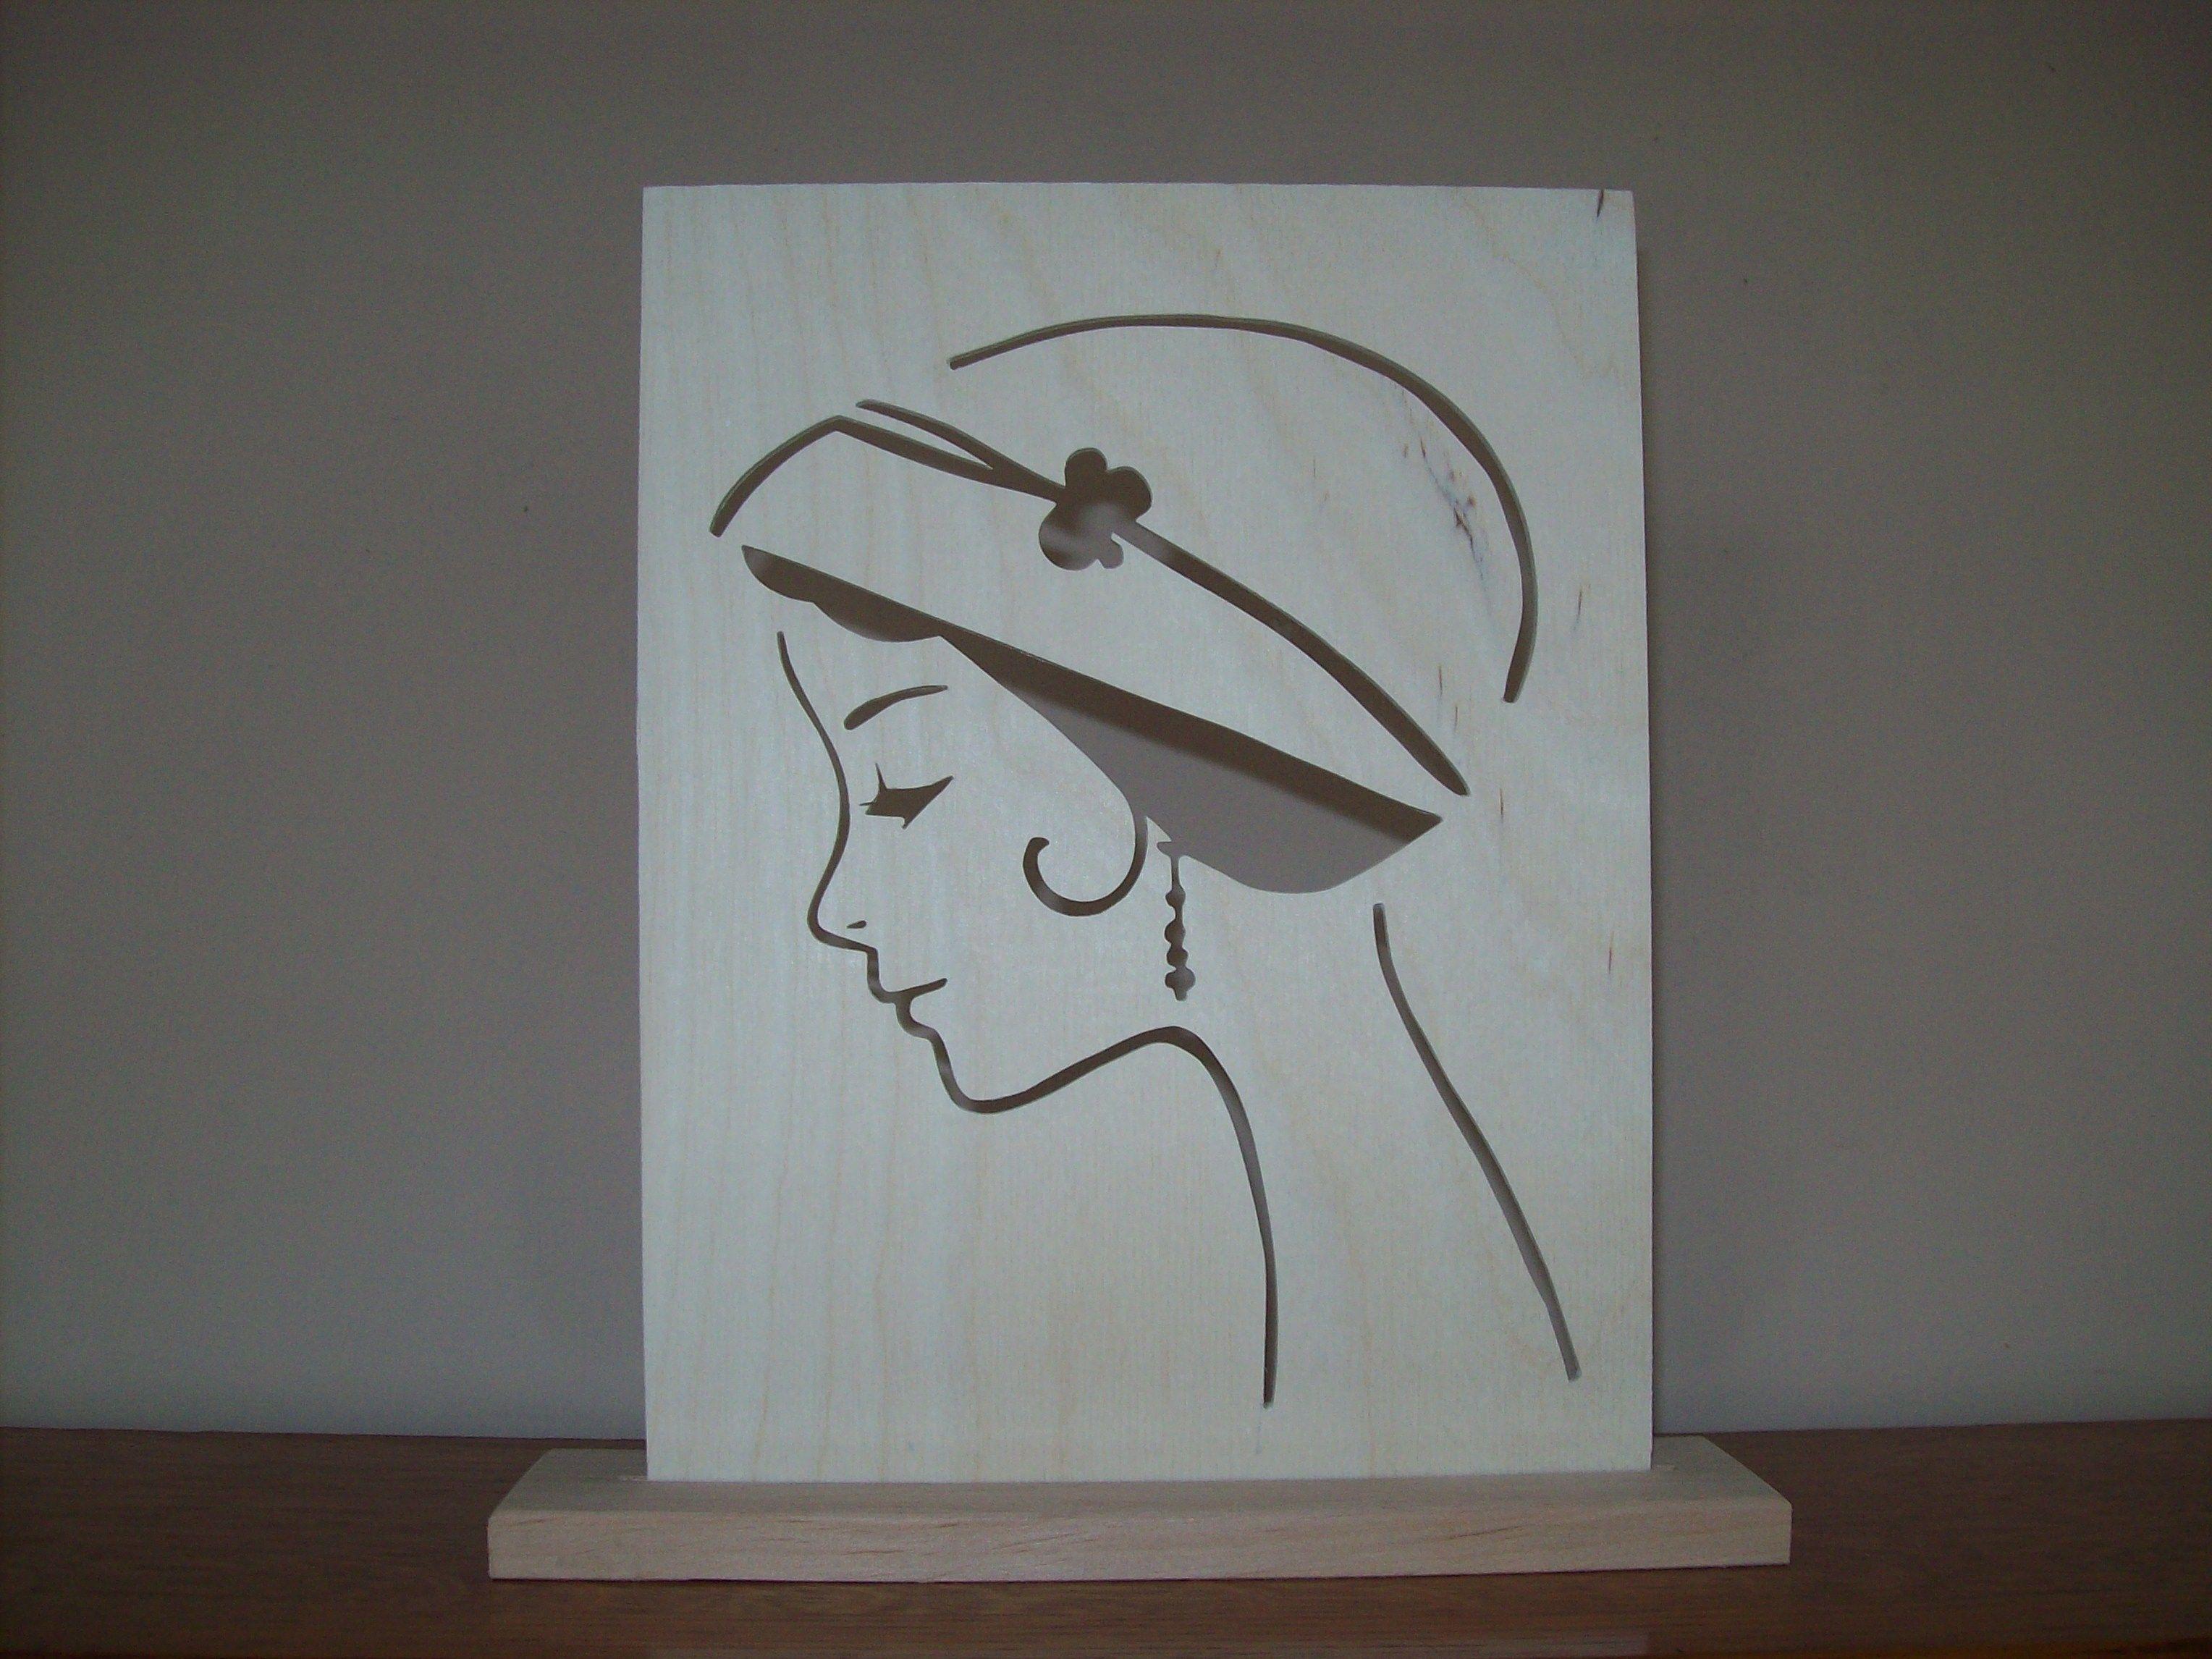 Hand Made By Rozowyslonikdawandacom